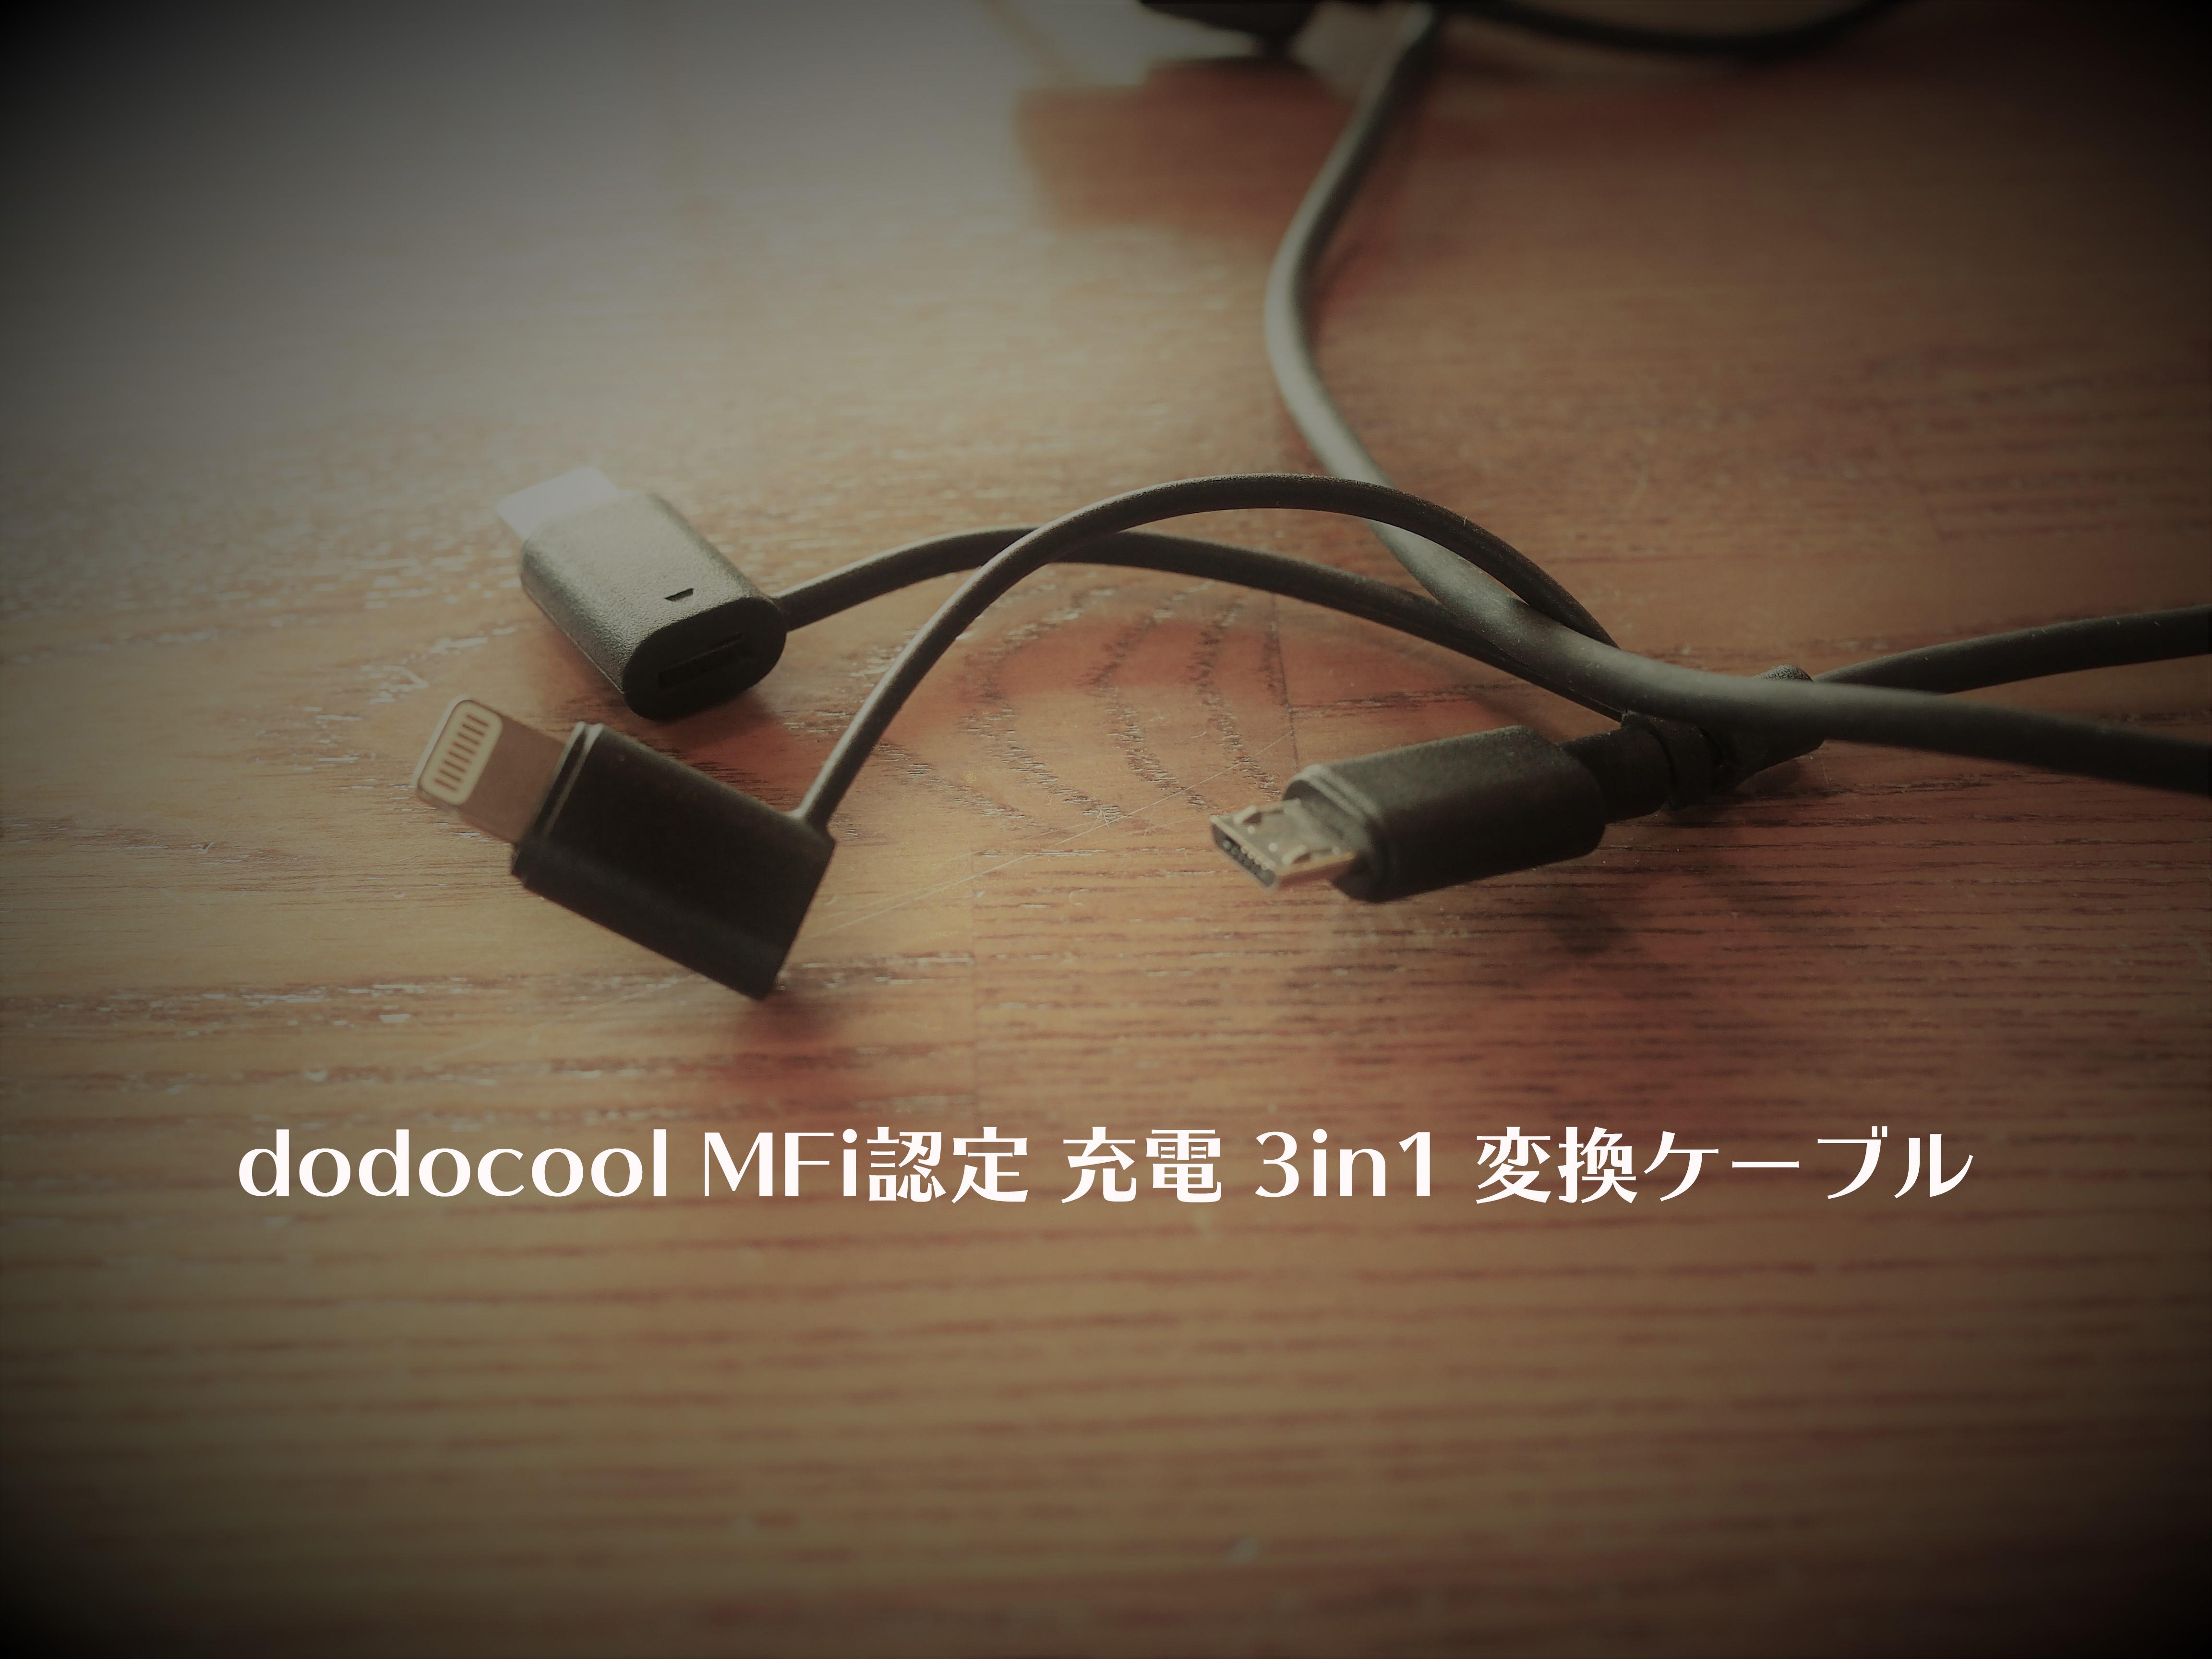 dodocool-3in1のイメージ写真